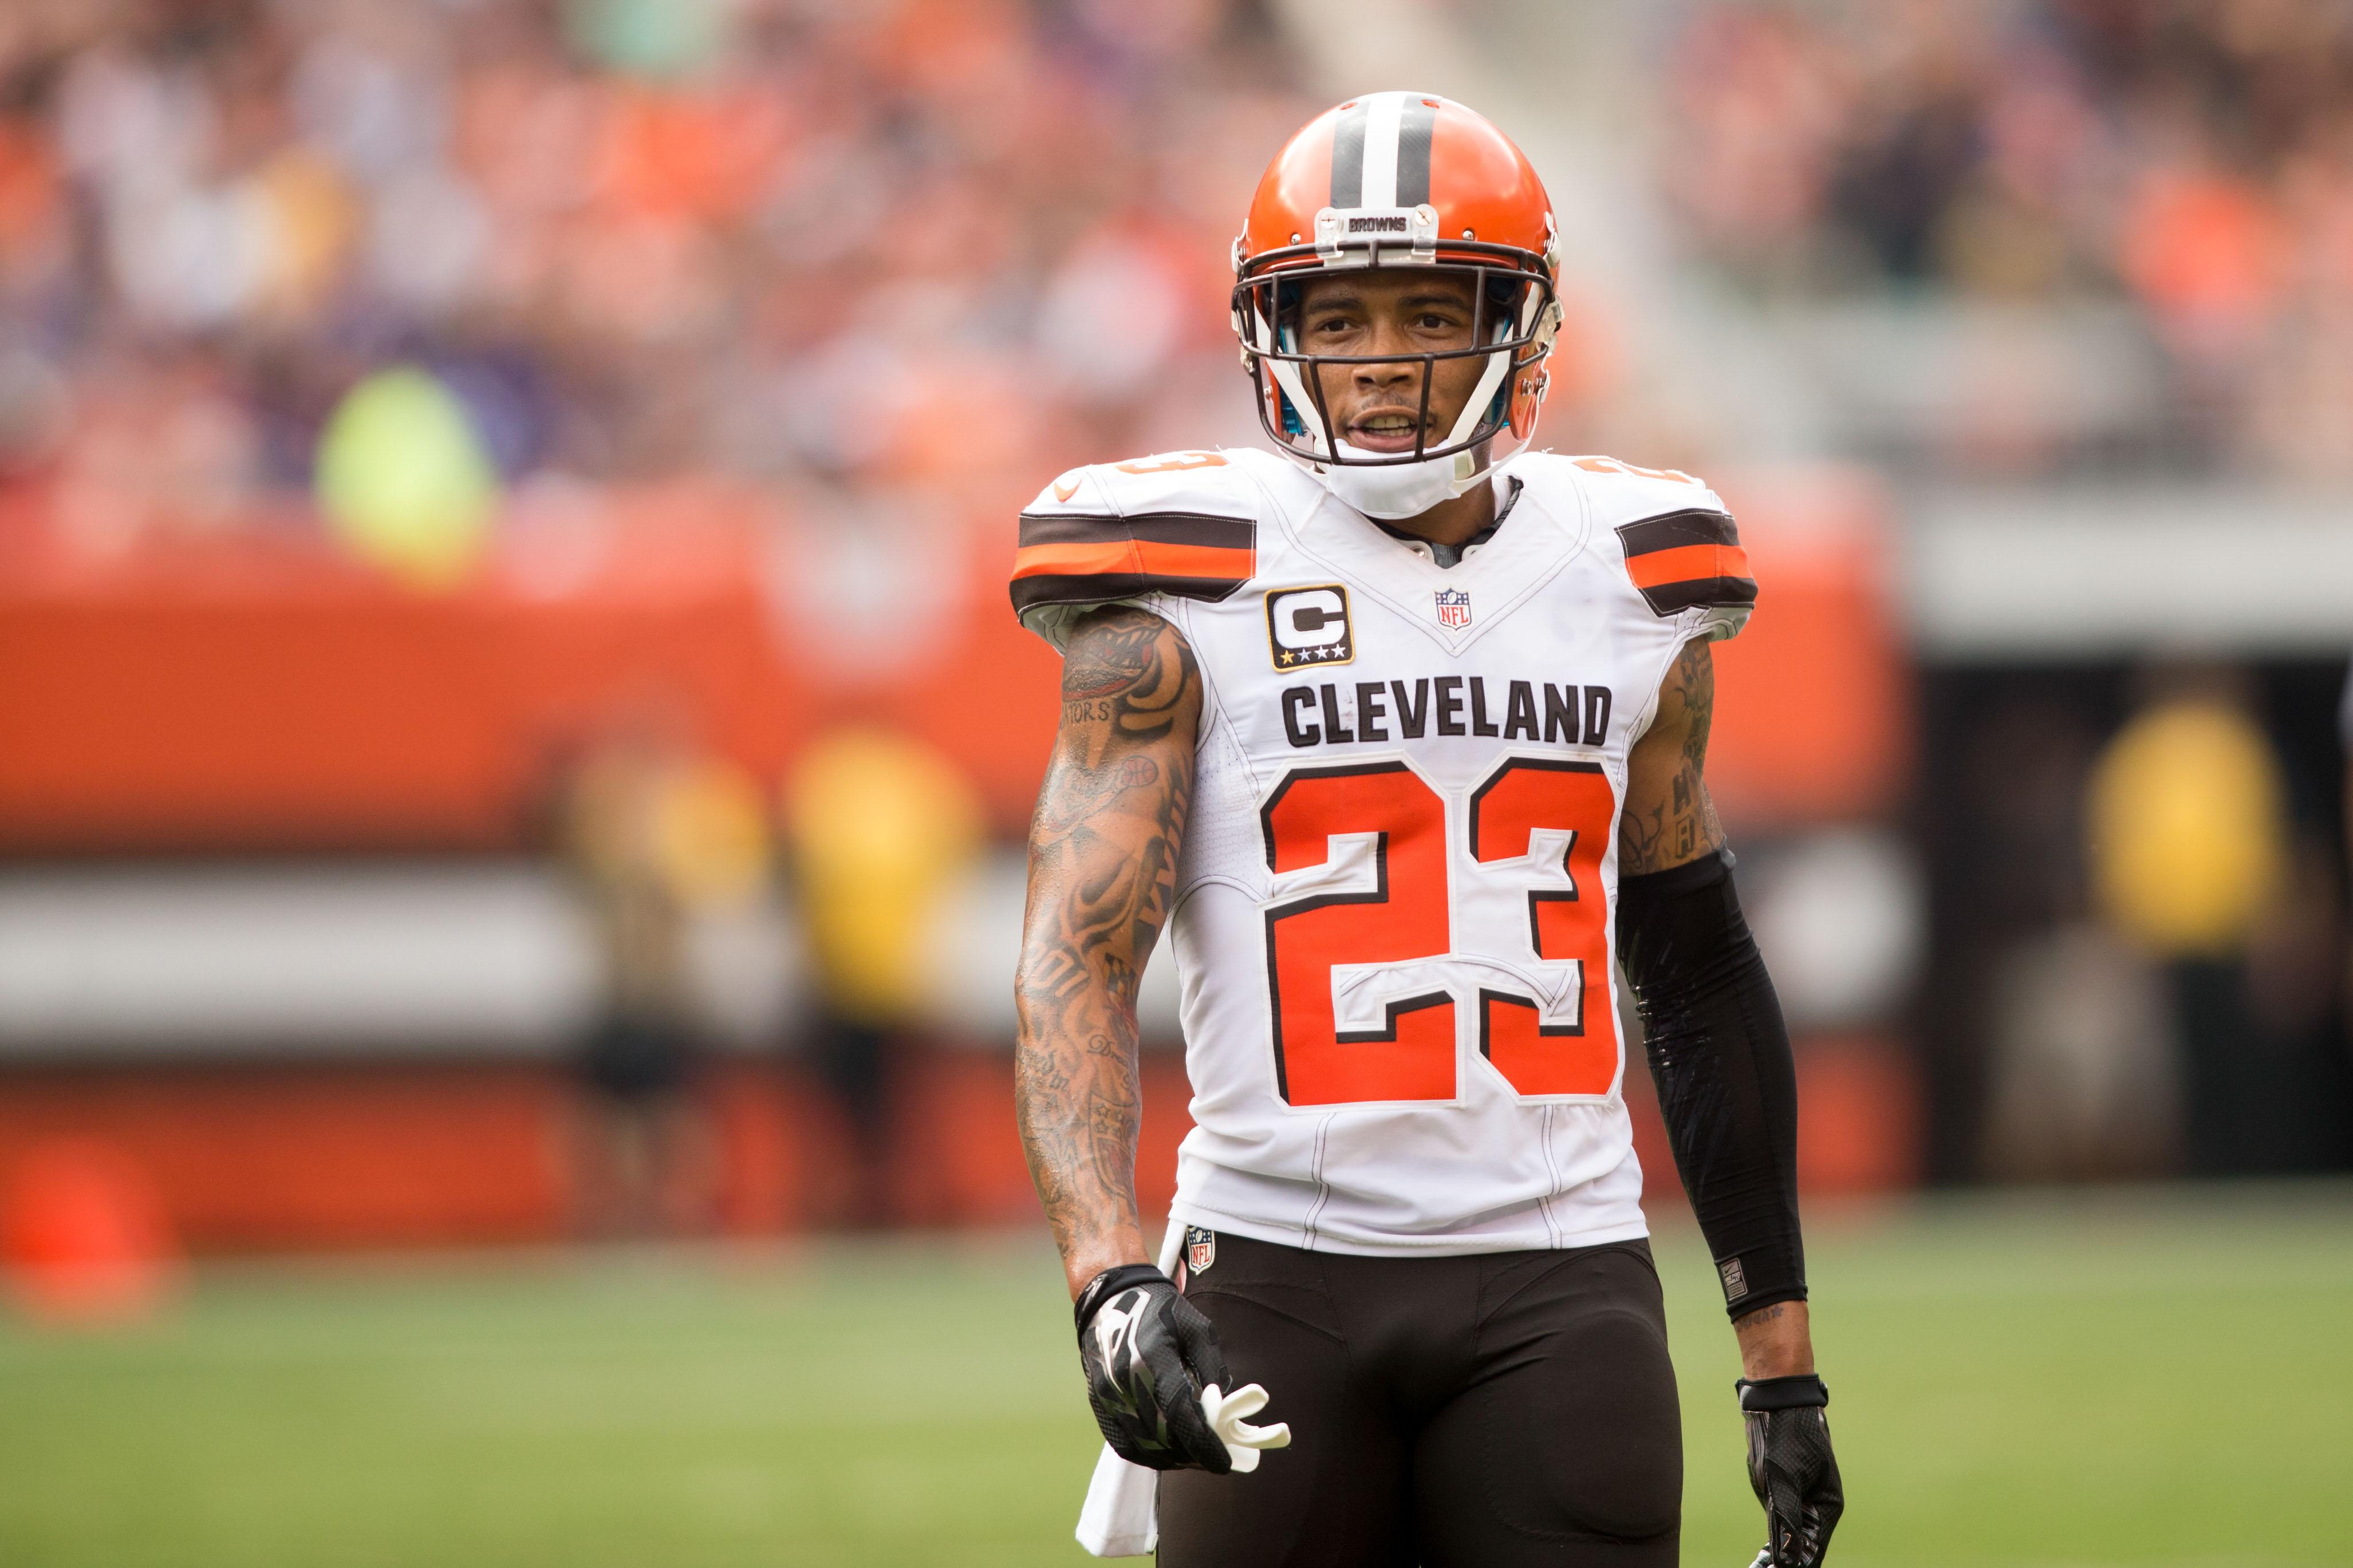 NFL: Baltimore Ravens at Cleveland Browns